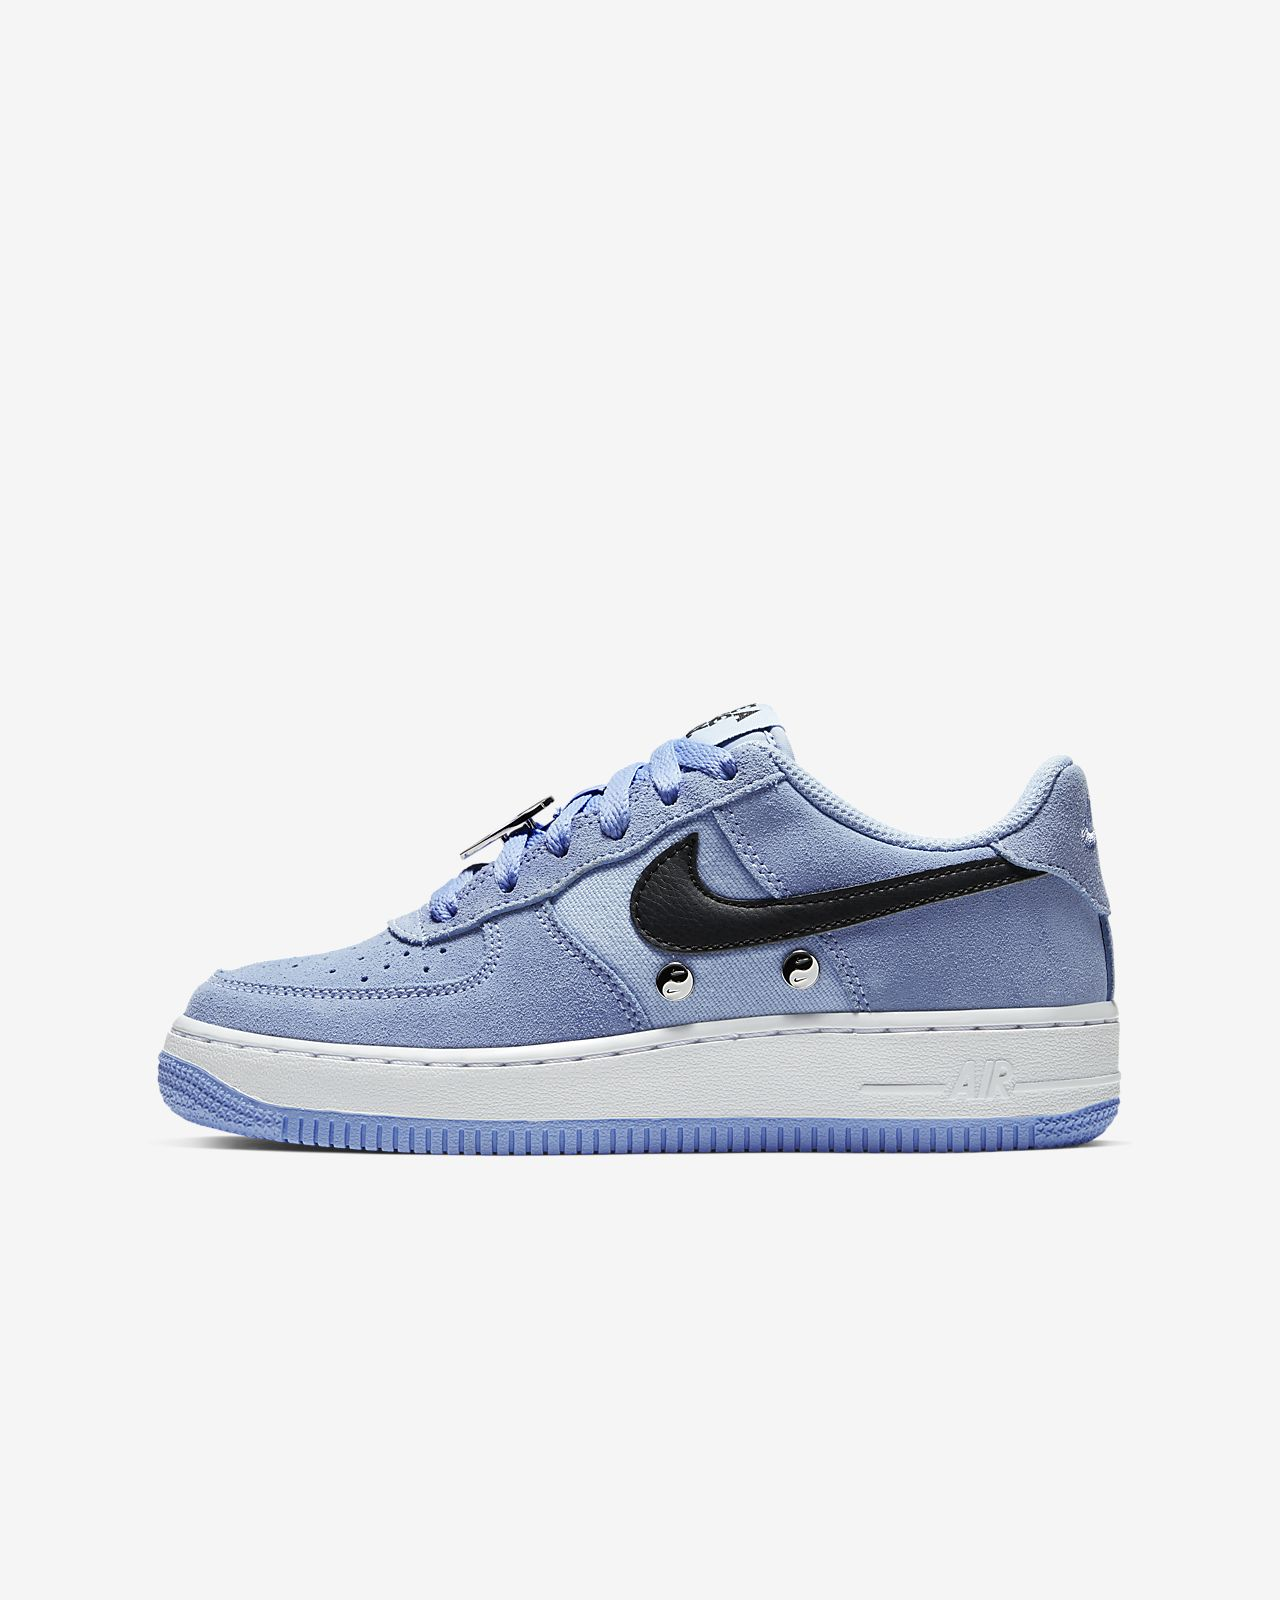 size 40 43846 60d58 ... Nike Air Force 1 LV8 Schuh für ältere Kinder